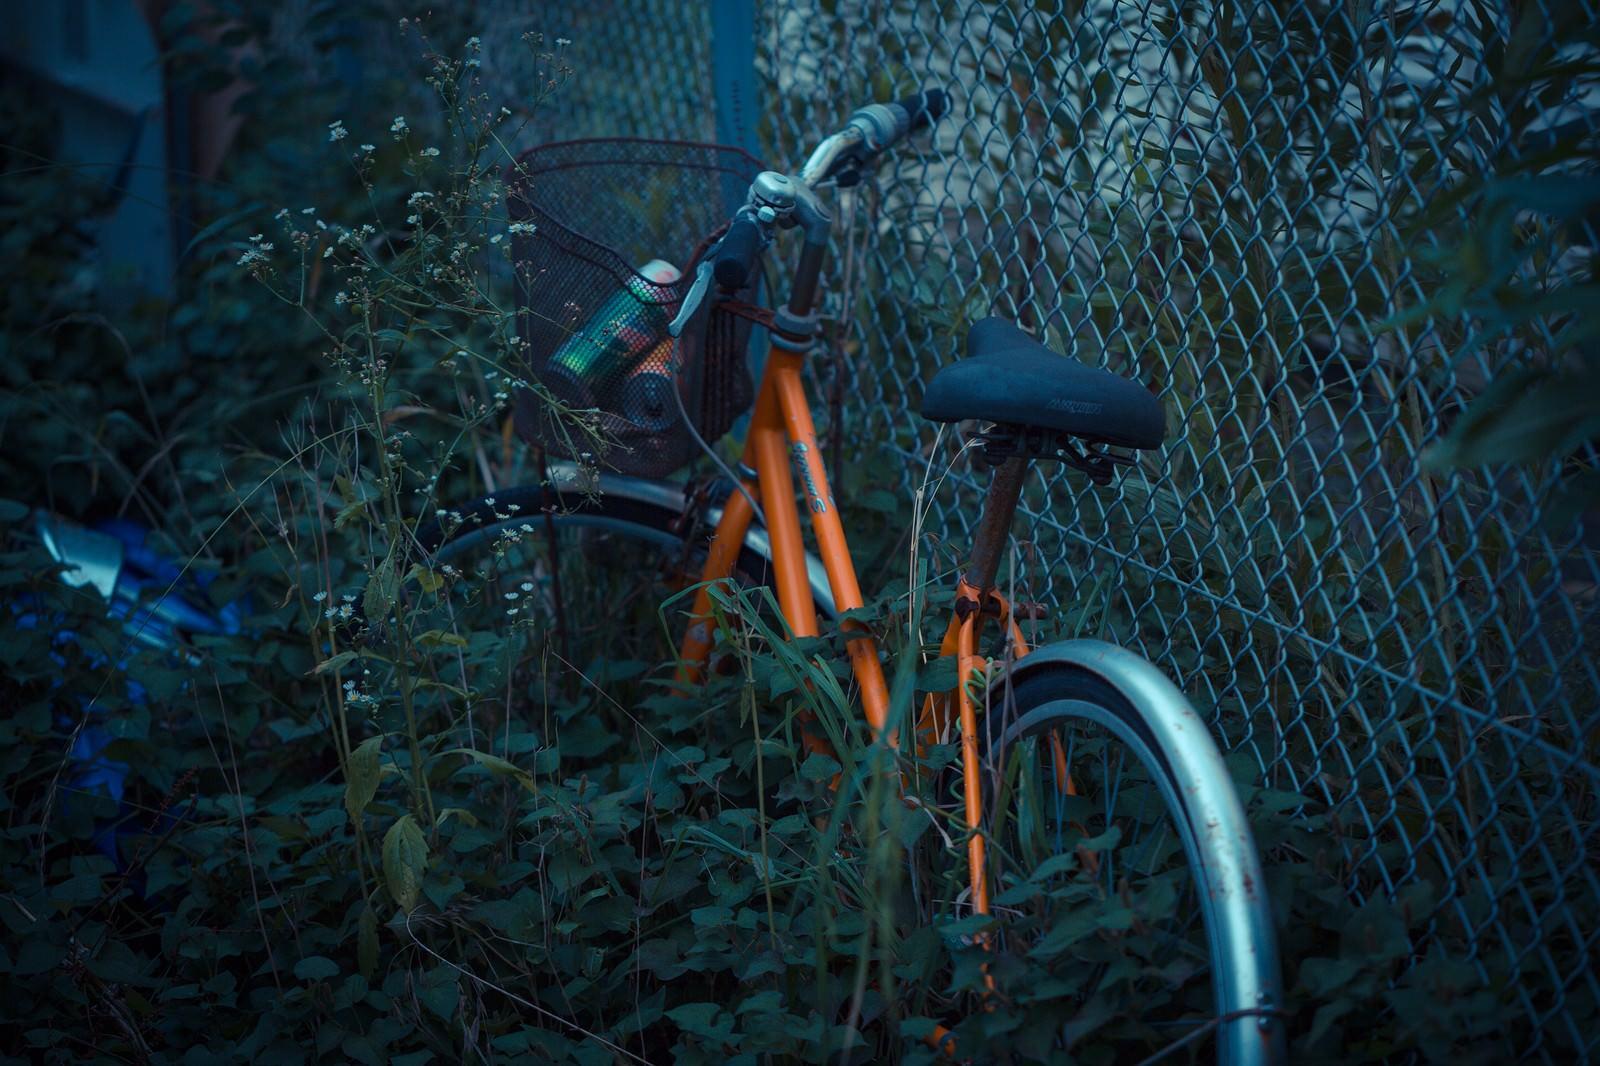 自転車の 自転車 廃棄 無料 : 自転車|フリー写真素材・無料 ...